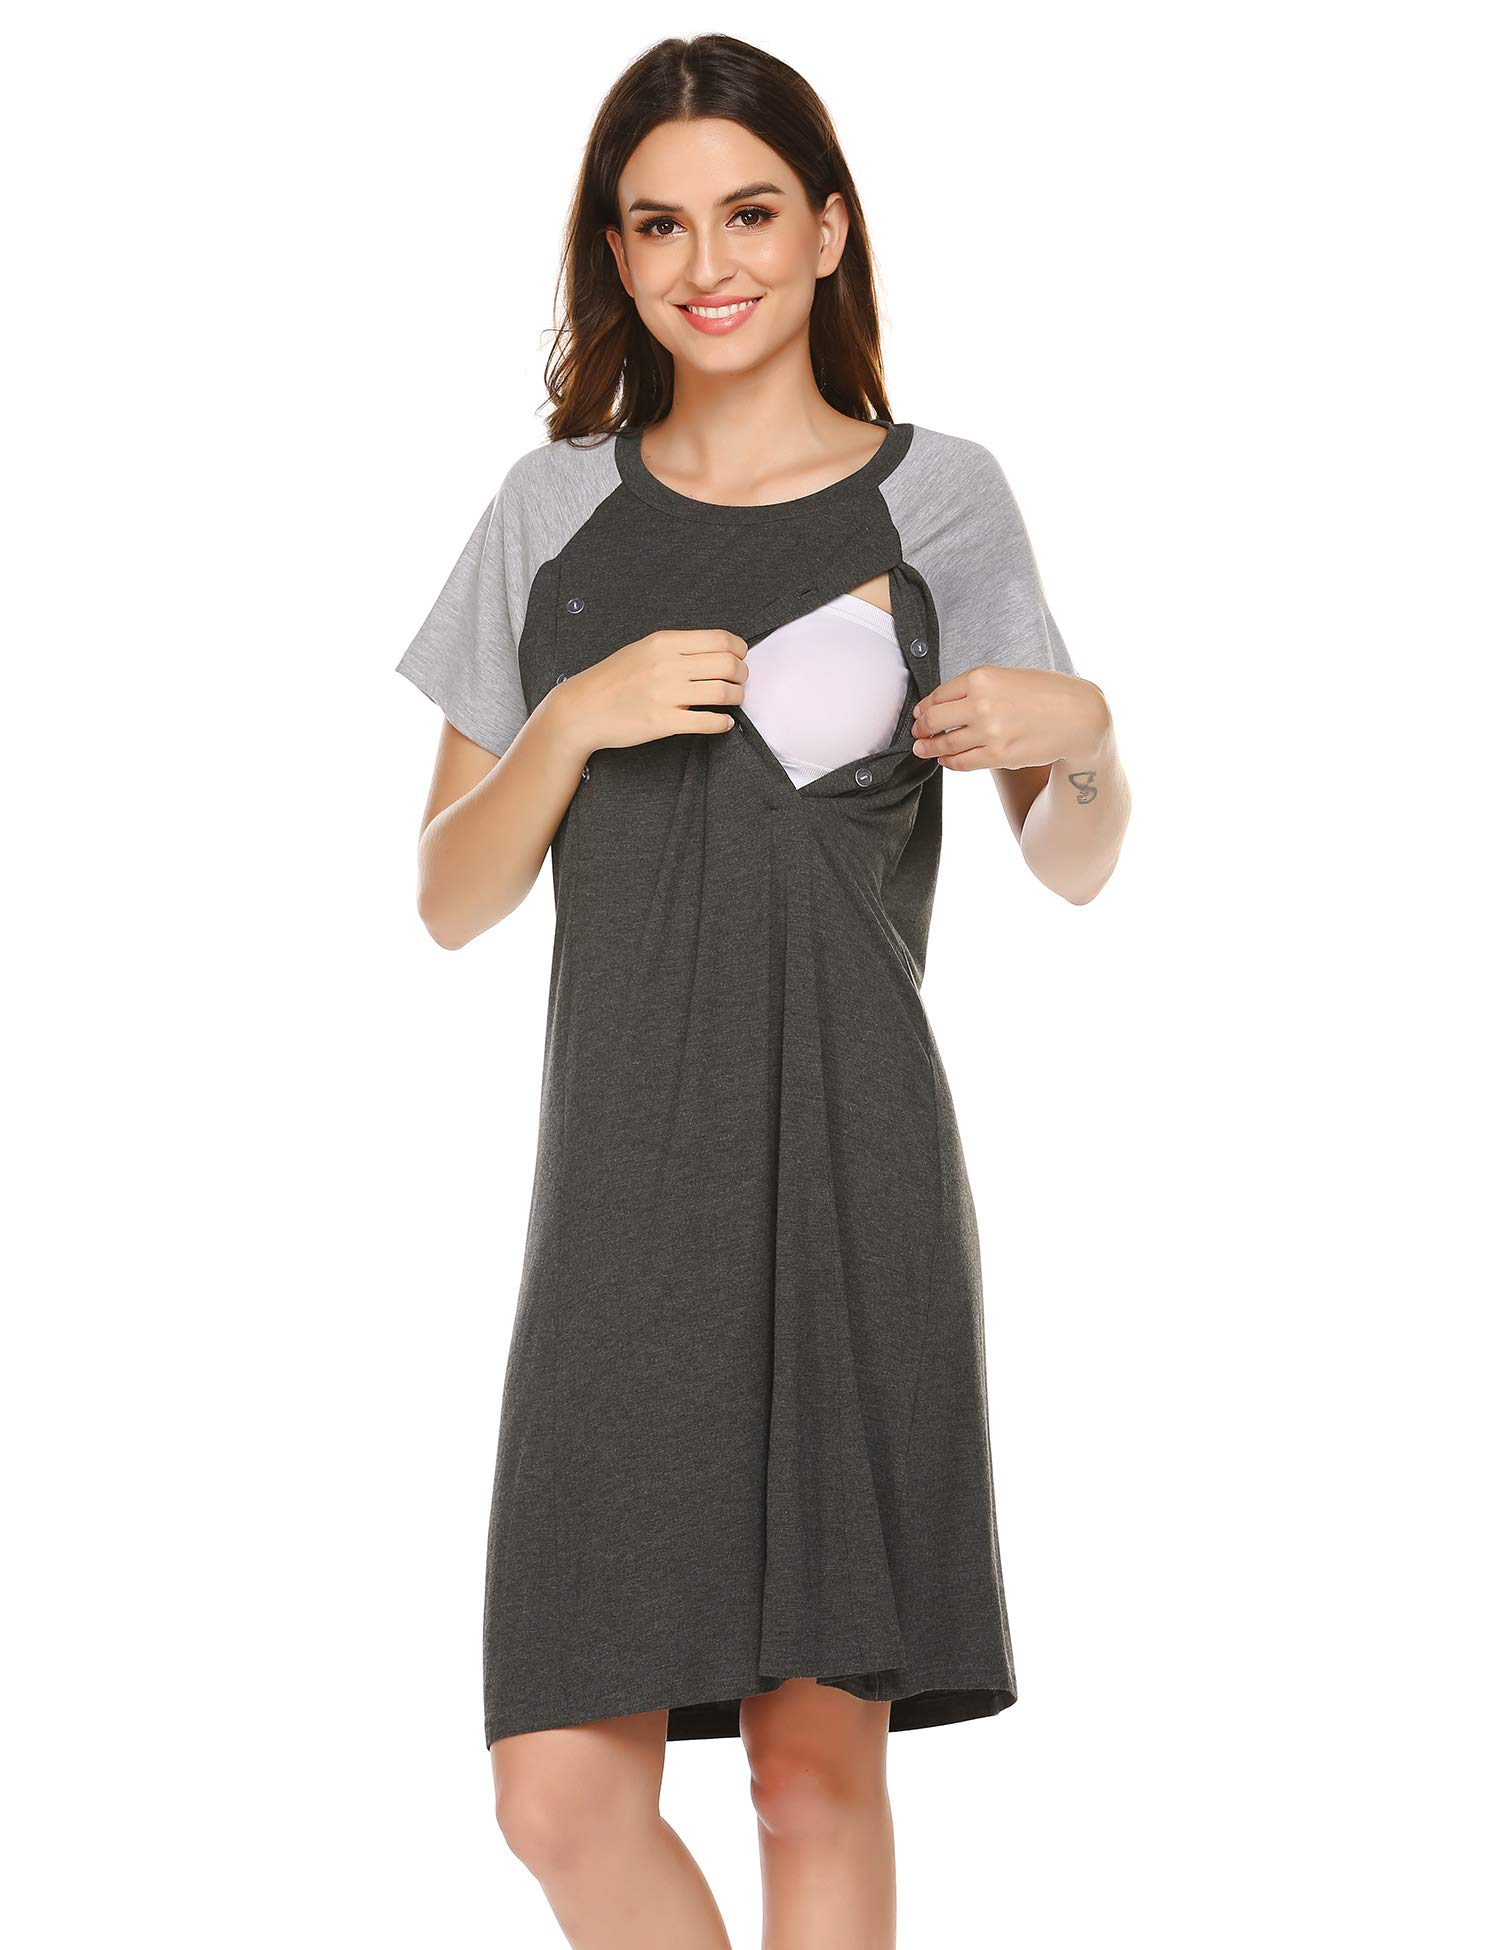 Ekouaer Plus Size Maternity Nightgown Womens Short Sleeve Sleepshirt Soft Cotton Nursing Nightwear(Deep Grey,Medium) by Ekouaer